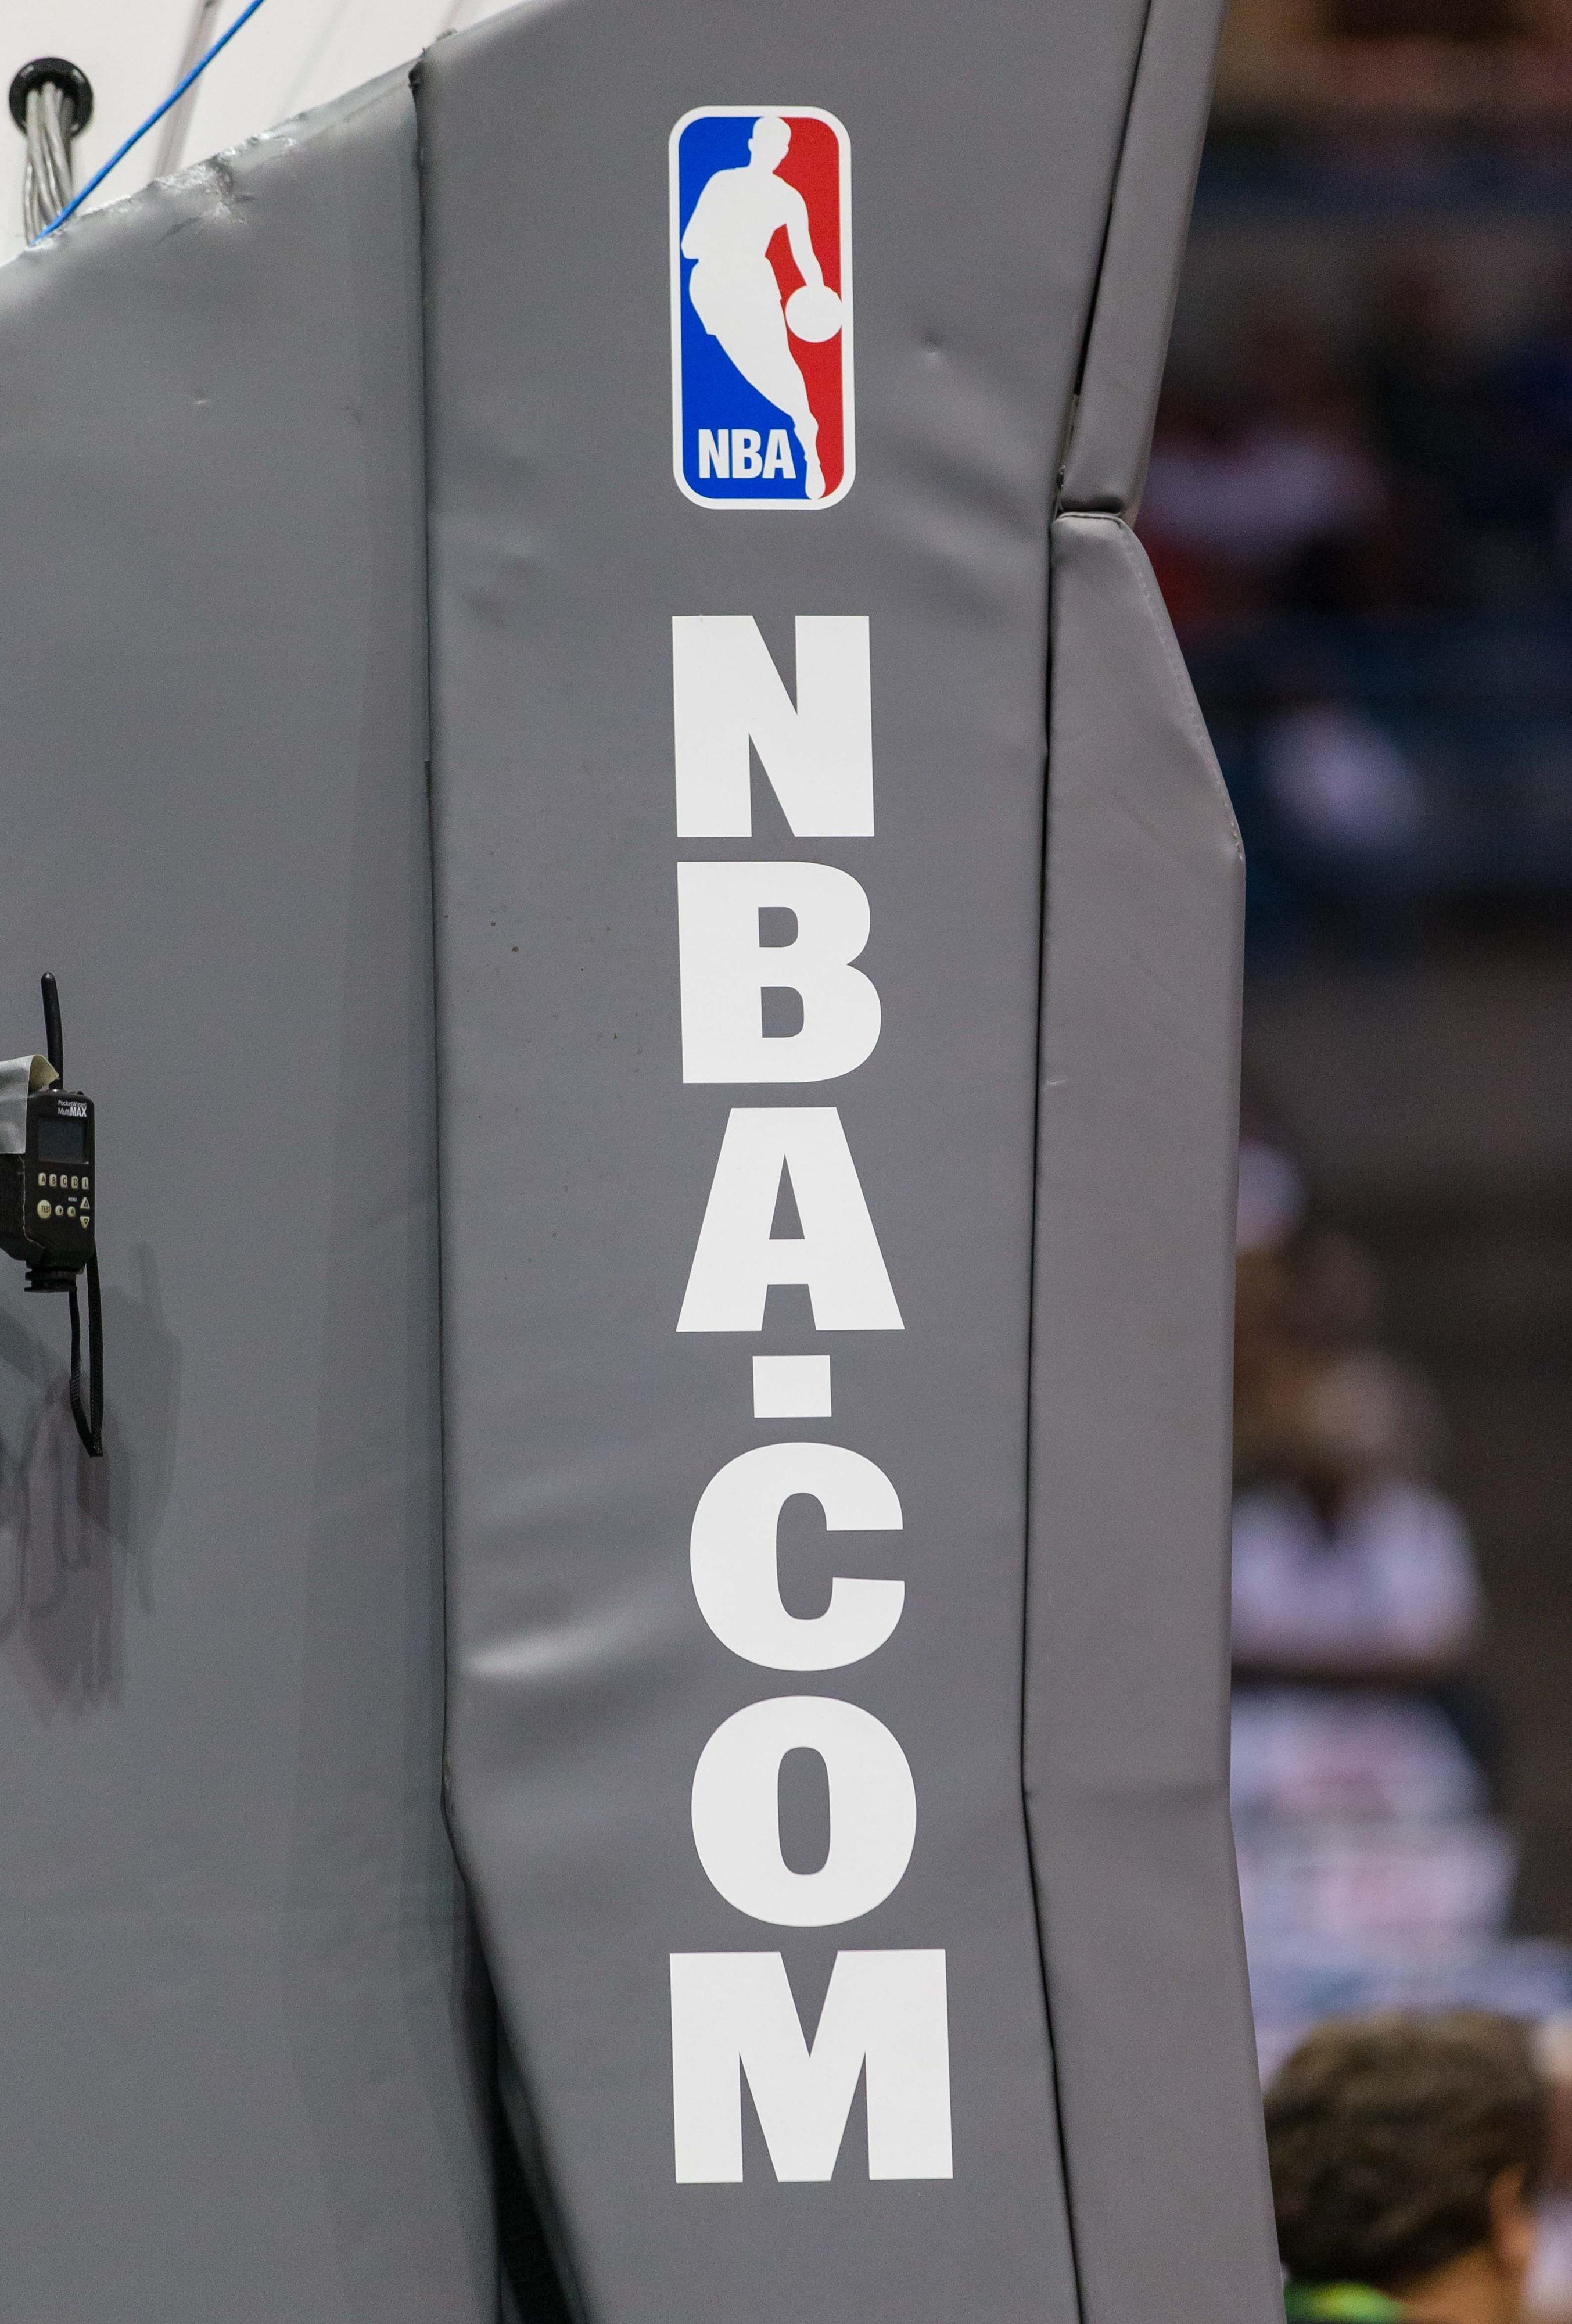 Insert new slogan for 2013-14 season